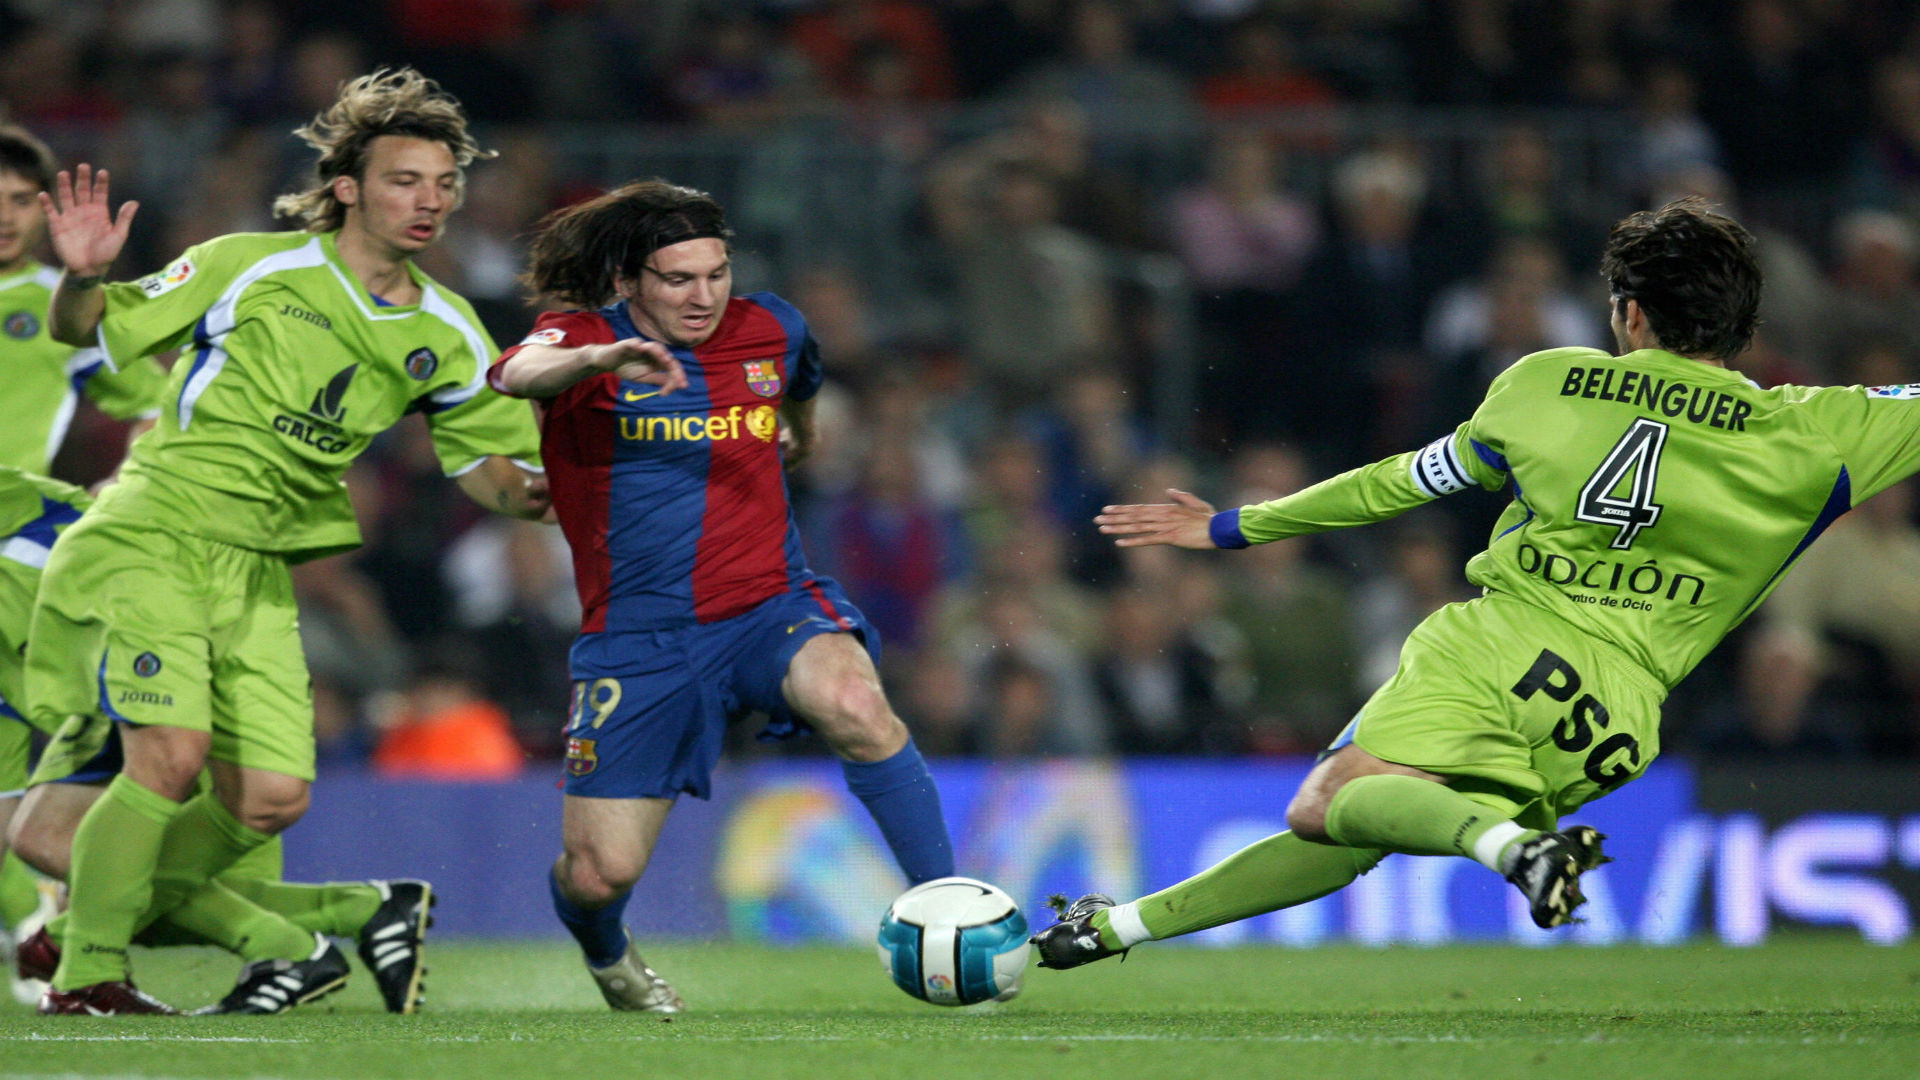 Messi Getafe Maradona